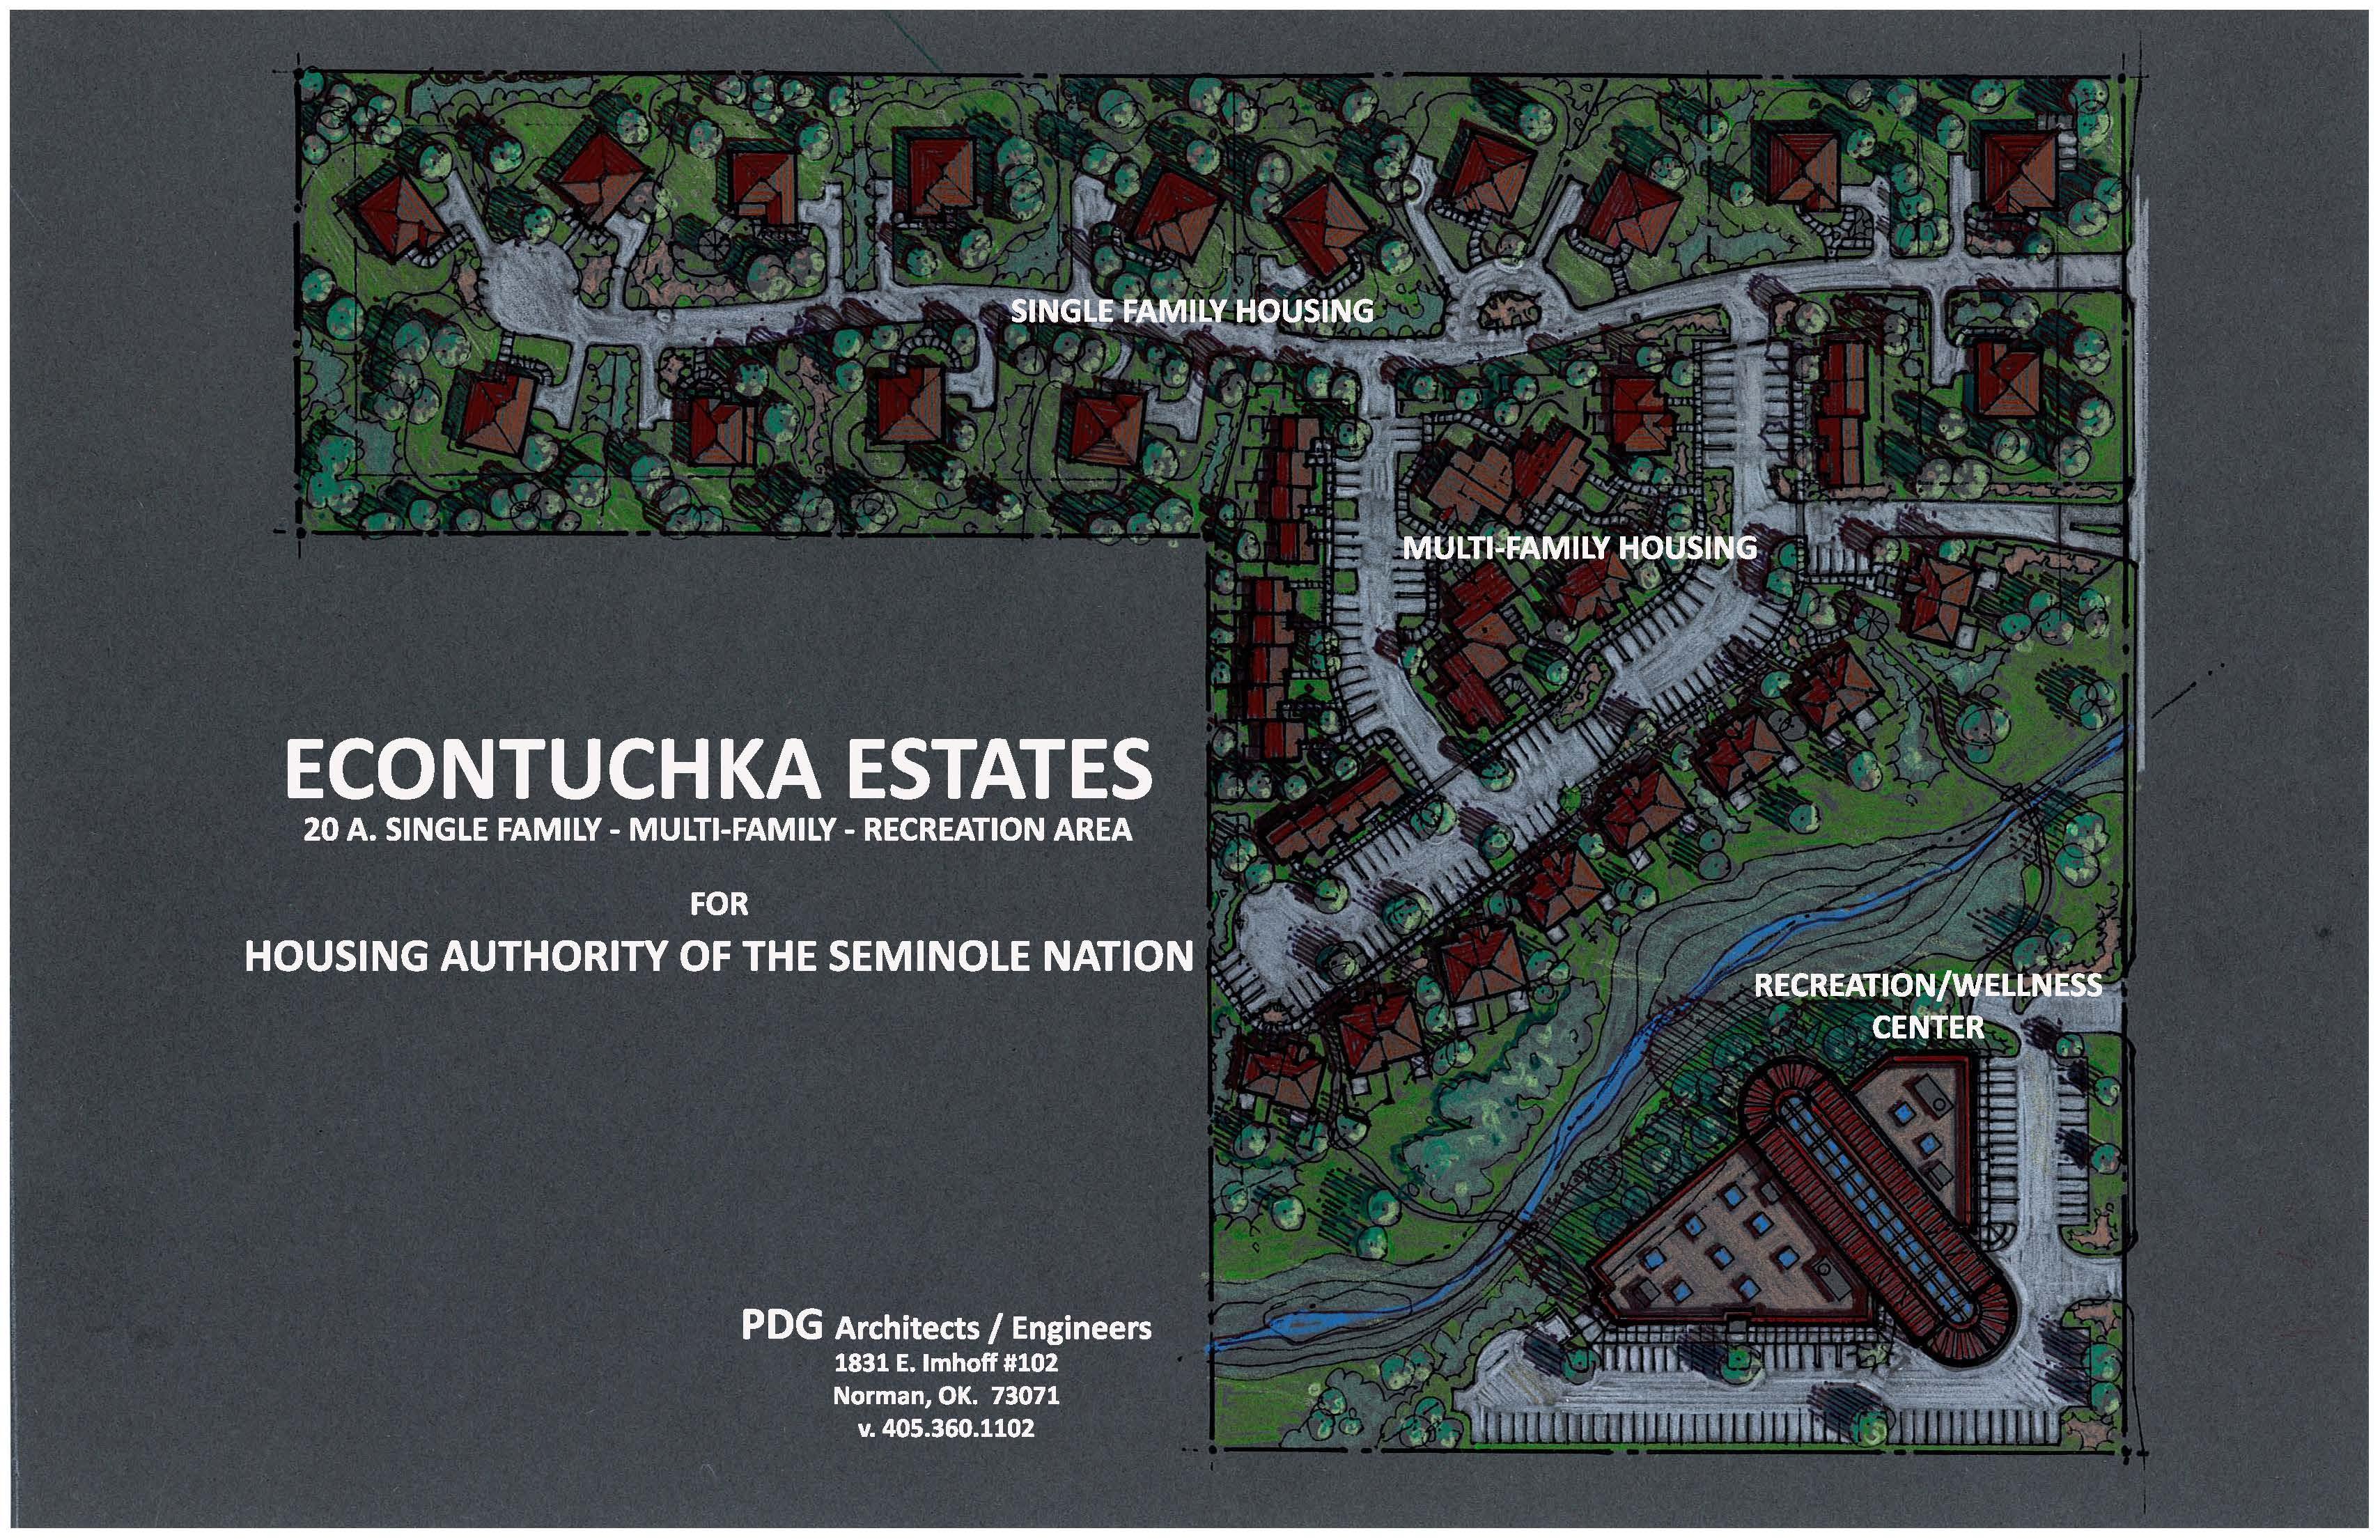 Econtuchka Estates